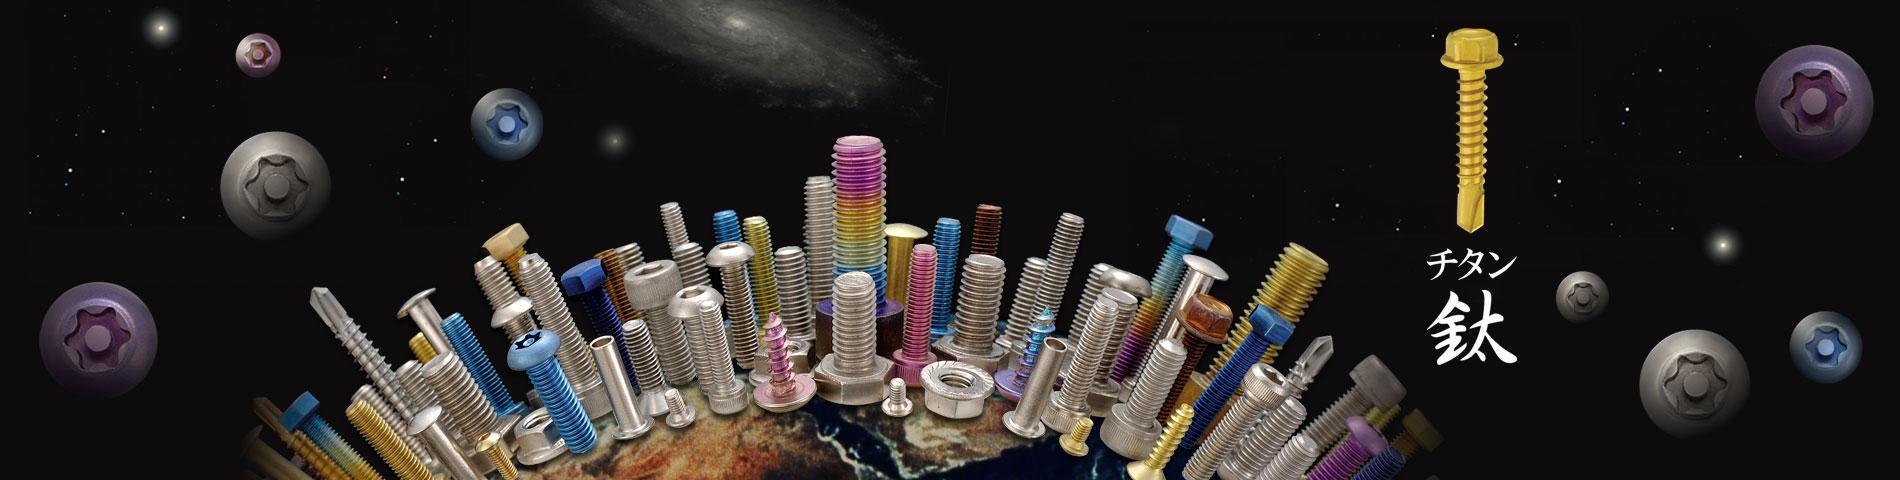 Sujetadores Nunca oxidados       Titanium       Omnipotent sujetadores de titanio proveedor -      Feng Yi